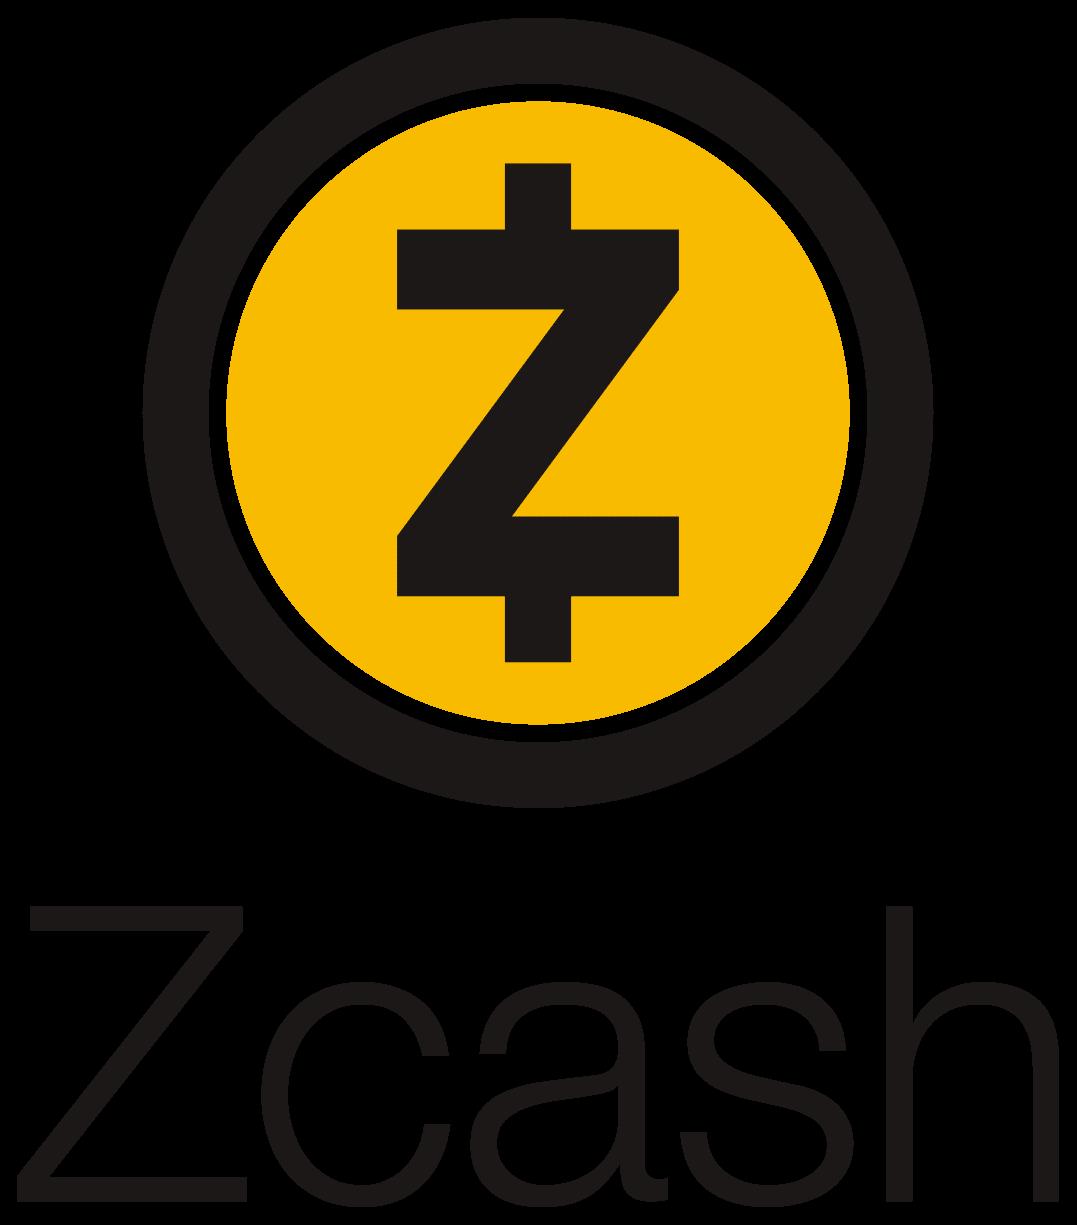 Zcash koers Zec crypto